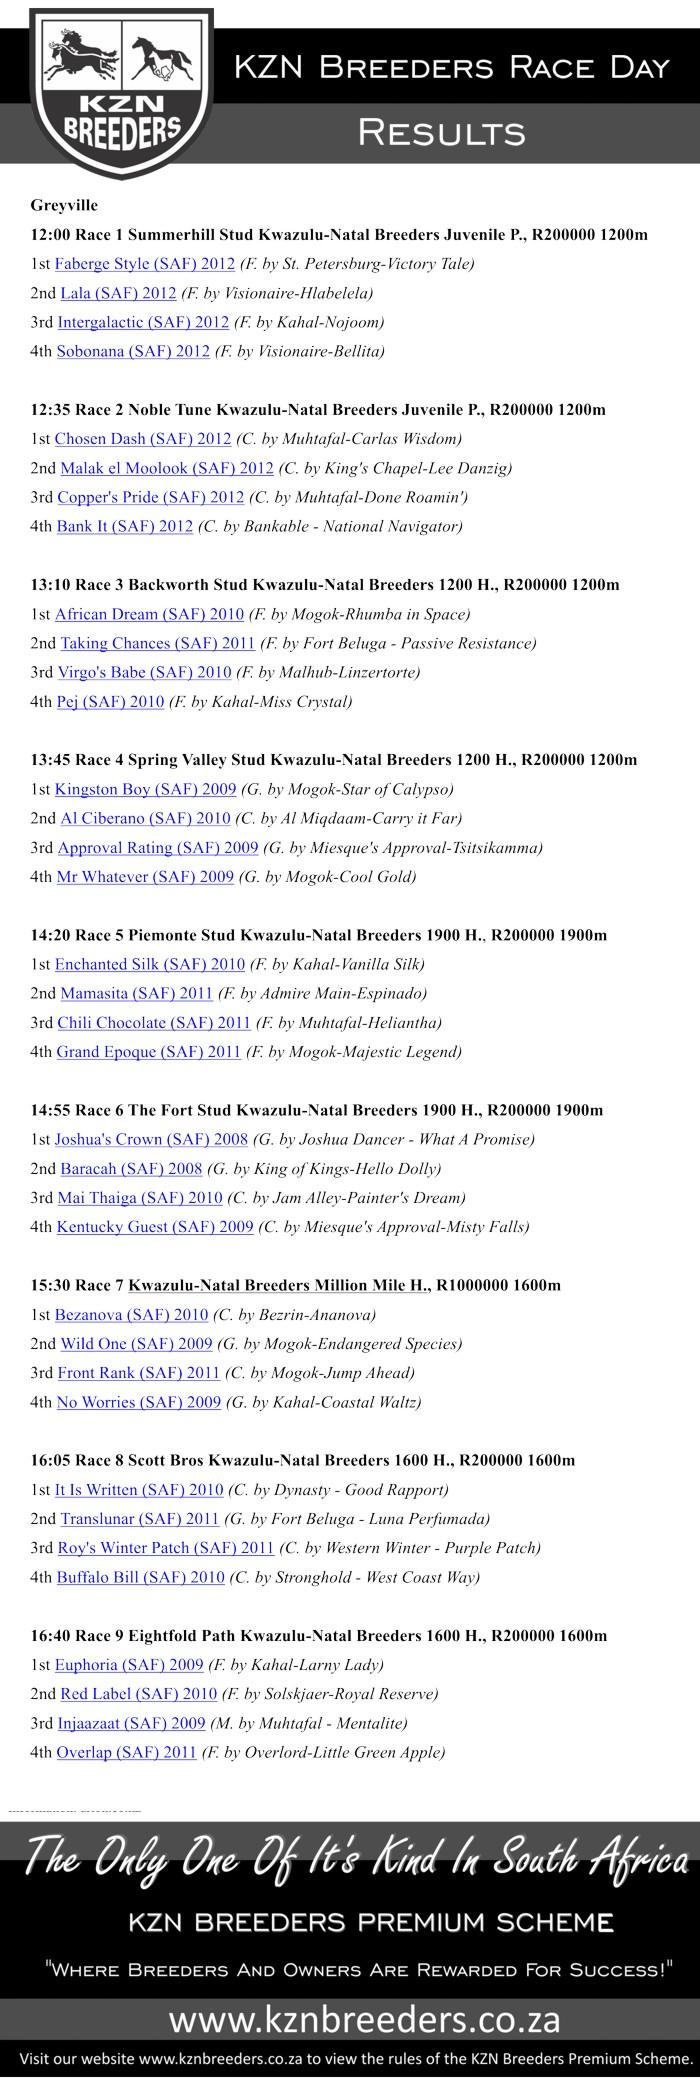 KZN Breeders Race Day Results